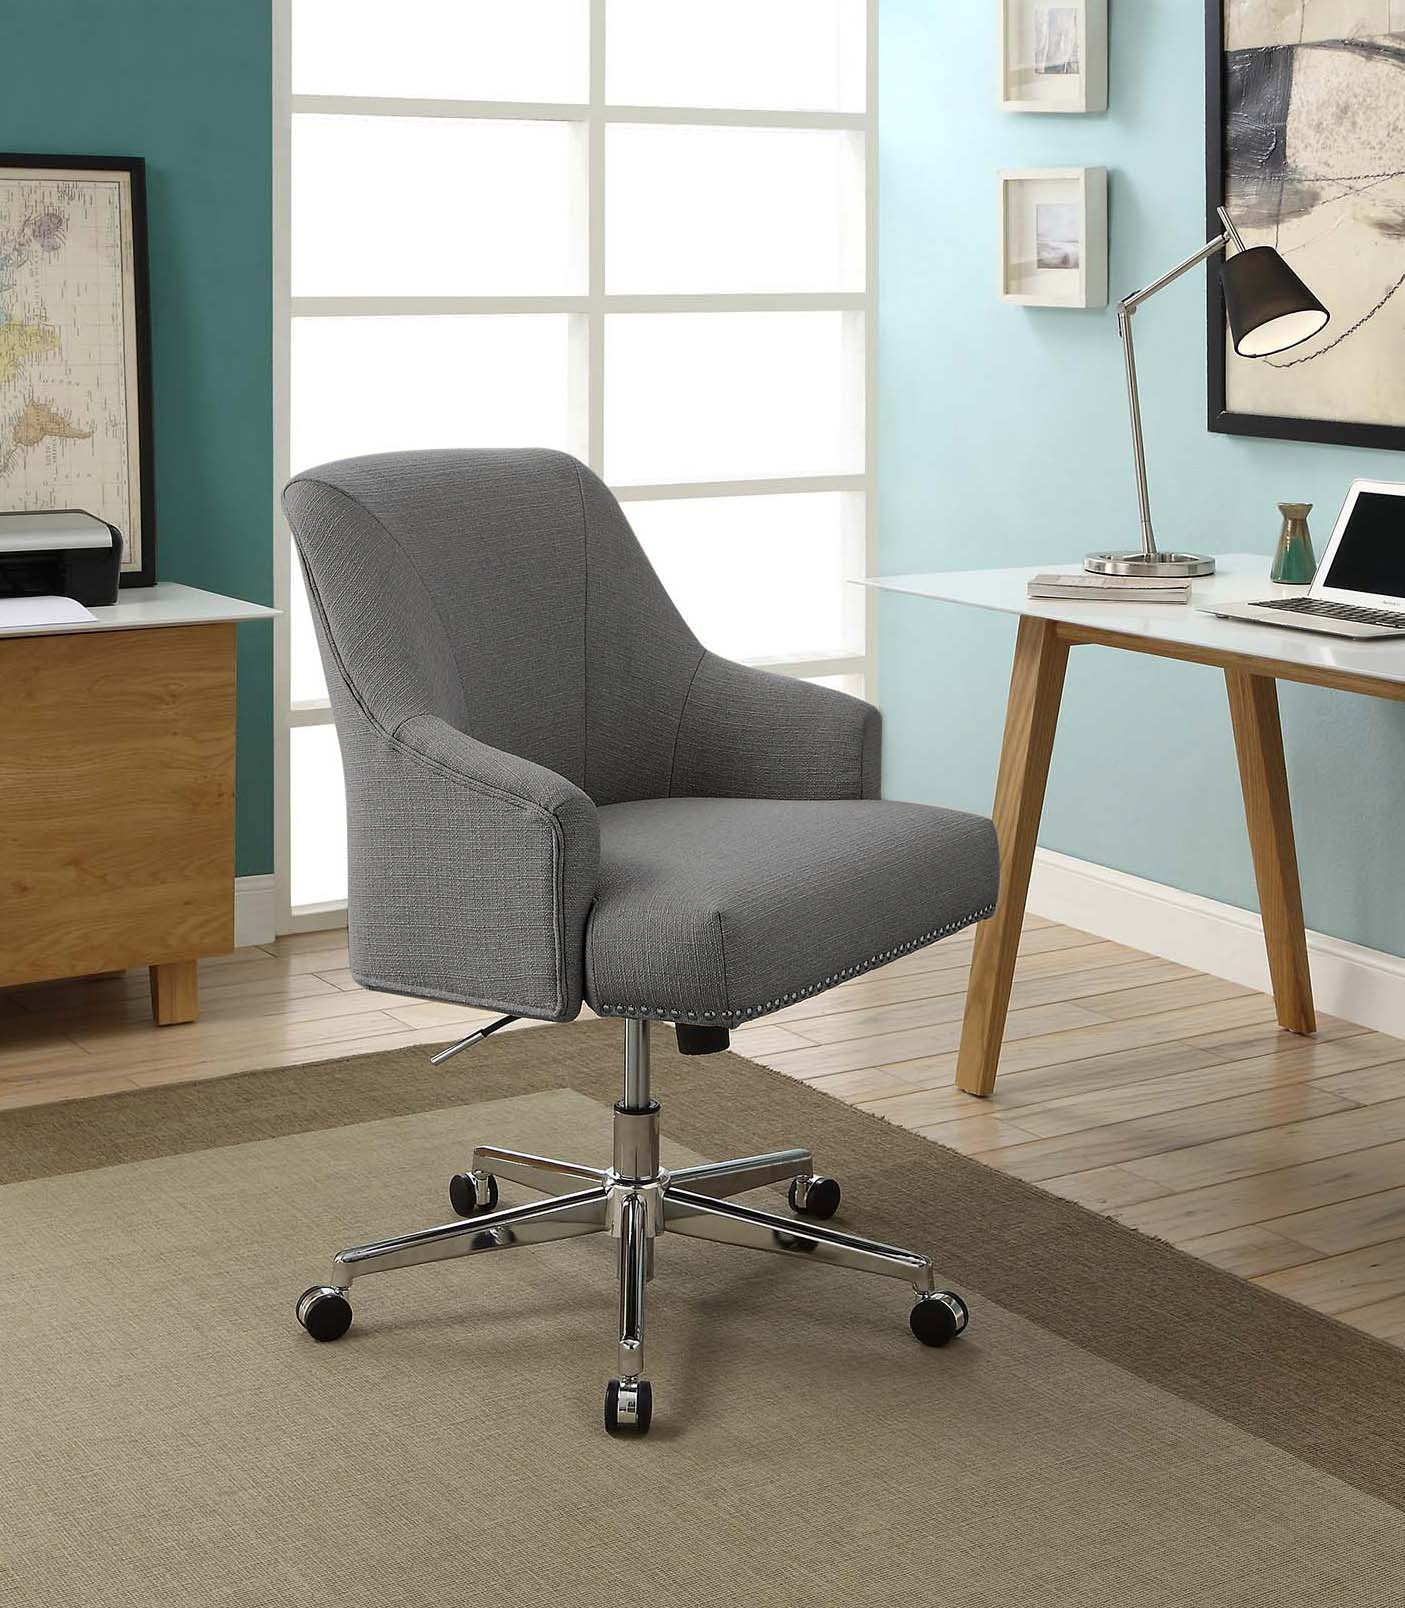 Serta Leighton Home Office Chair, Medium Gray by Serta